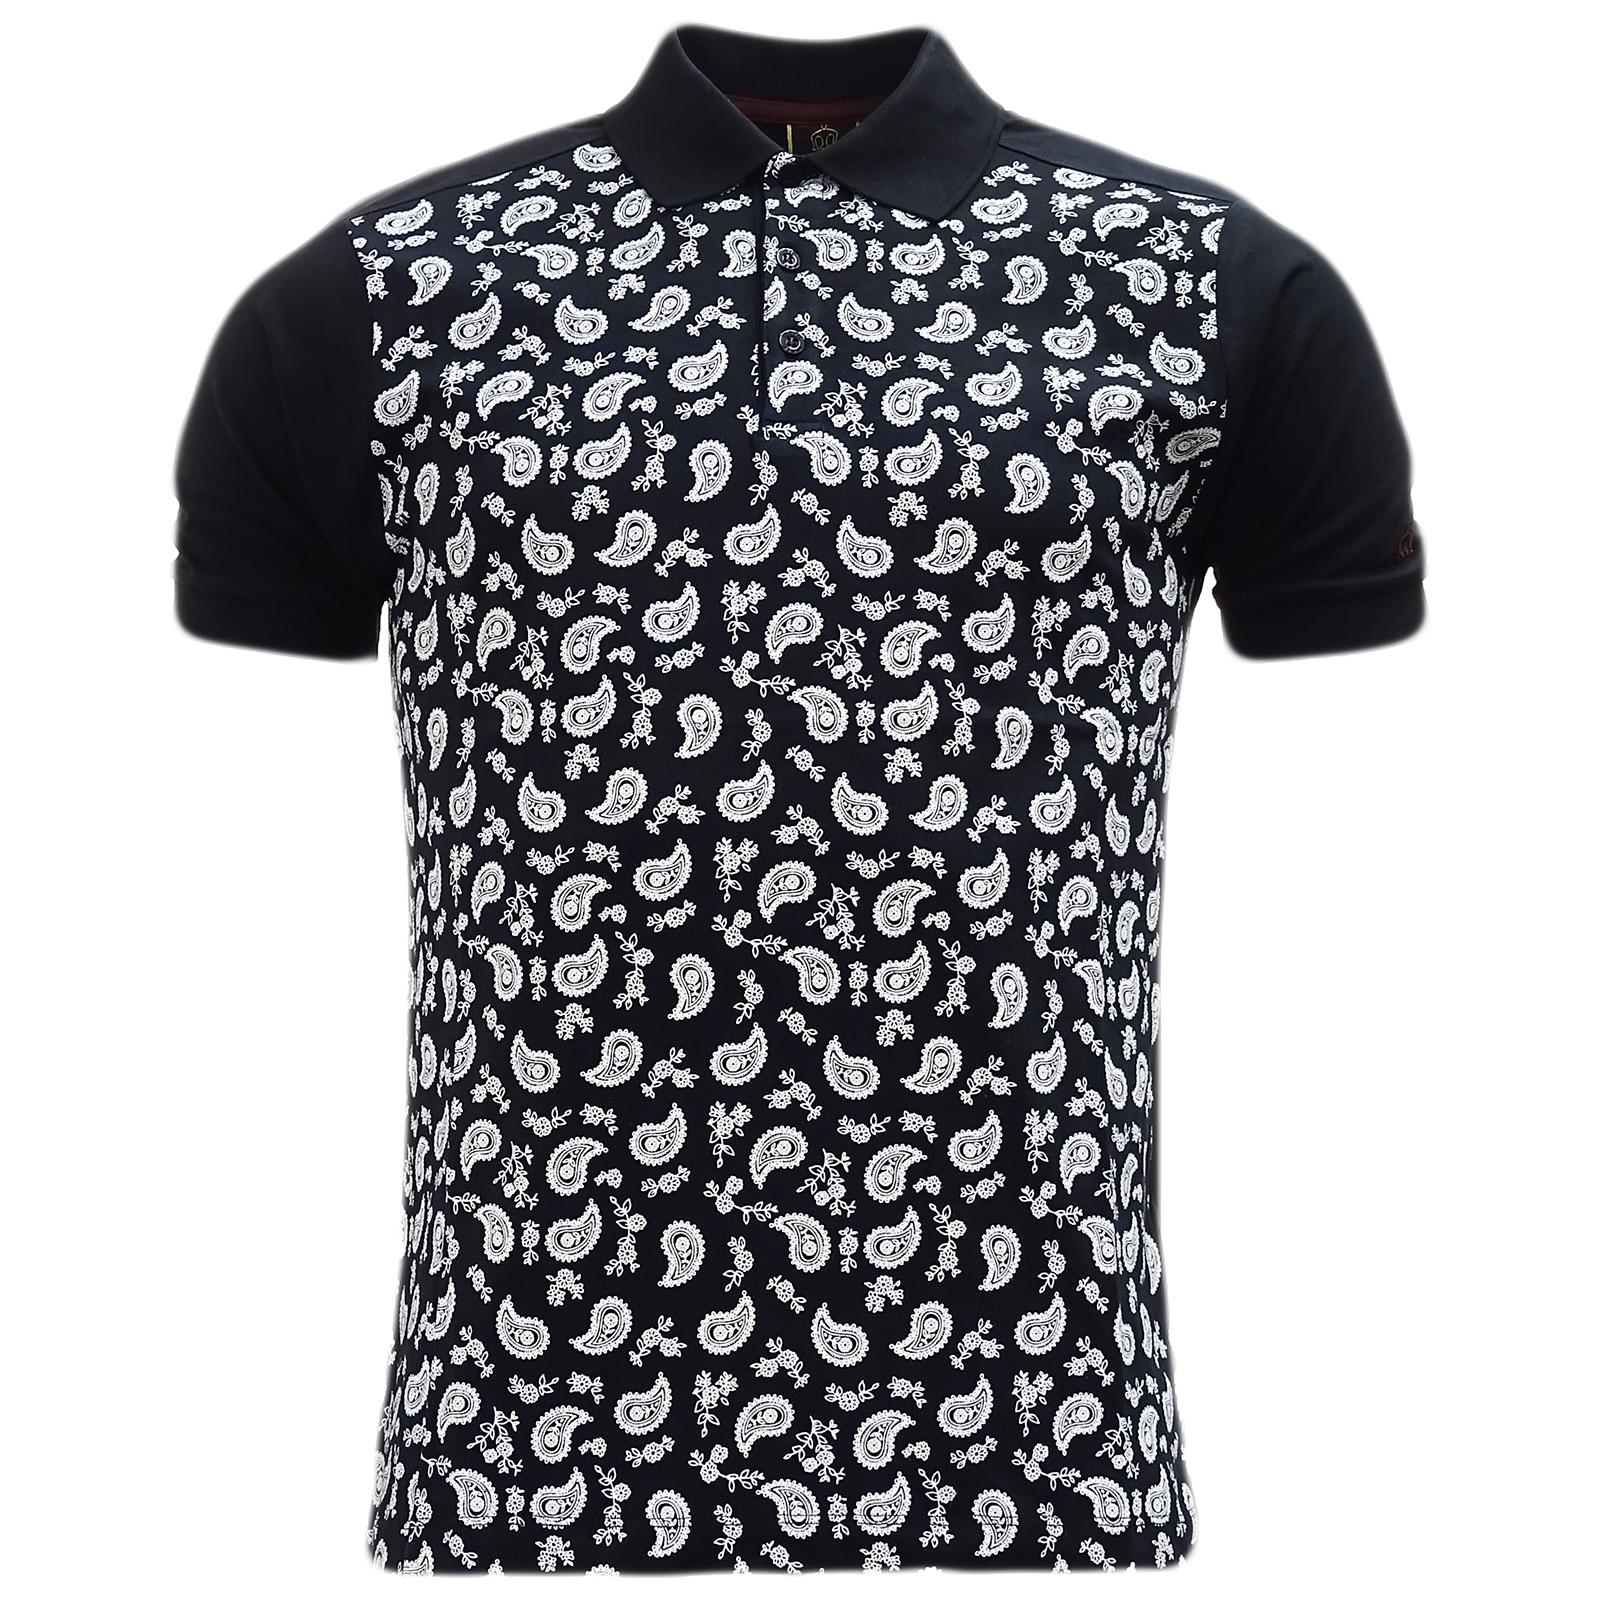 2c5d8f51c7c4 Merc Black Paisley Tear Drop Polo Shirt - Hunter